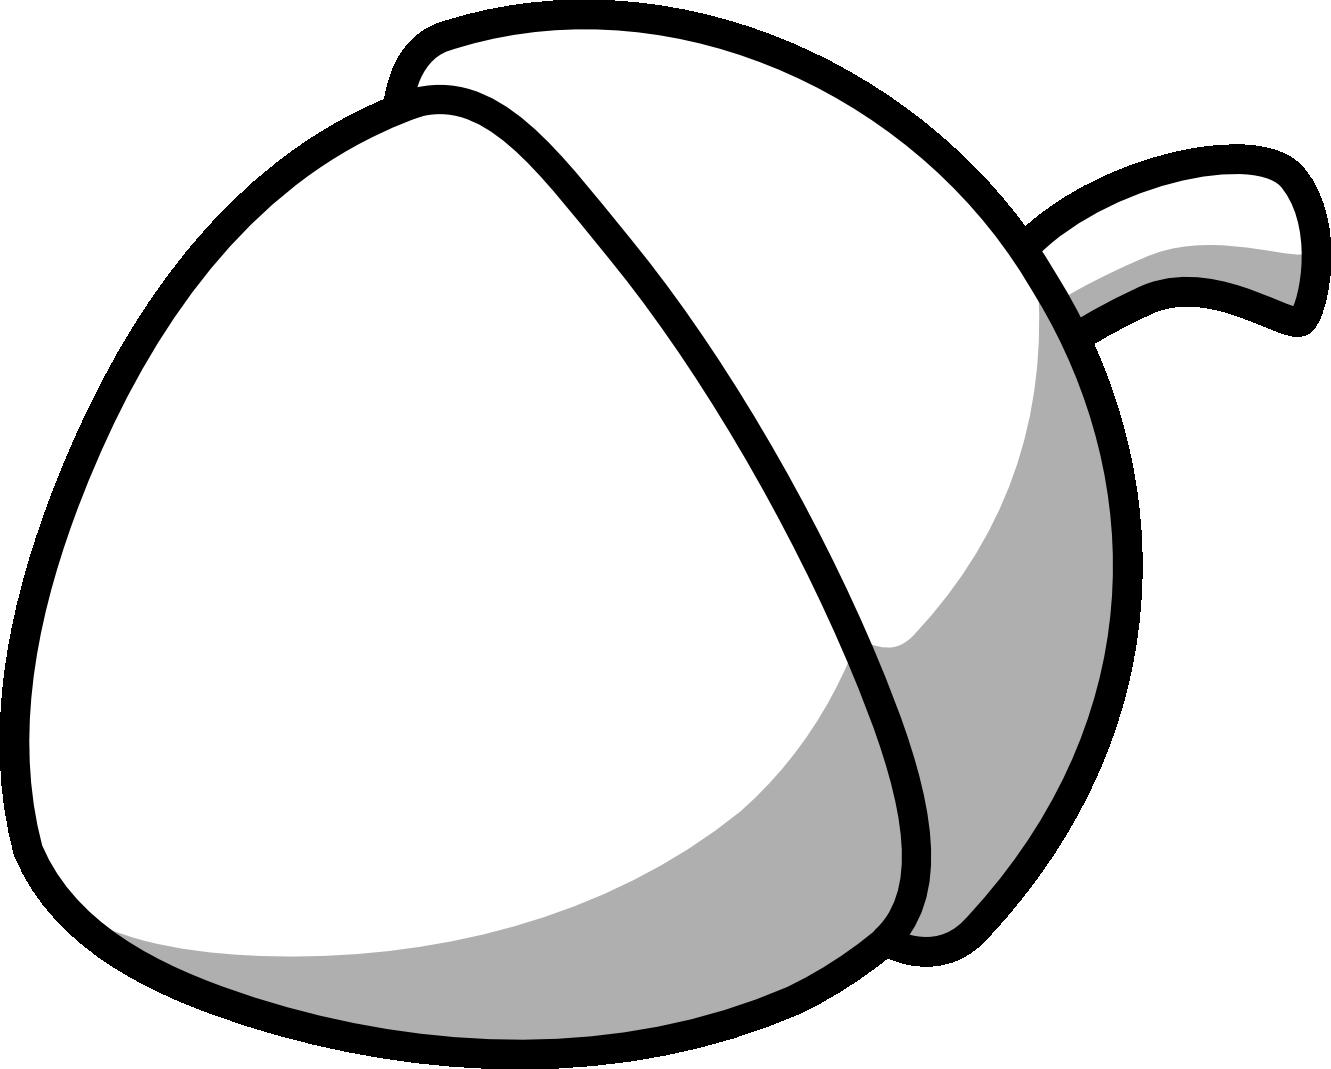 acorn%20clipart%20black%20and%20white